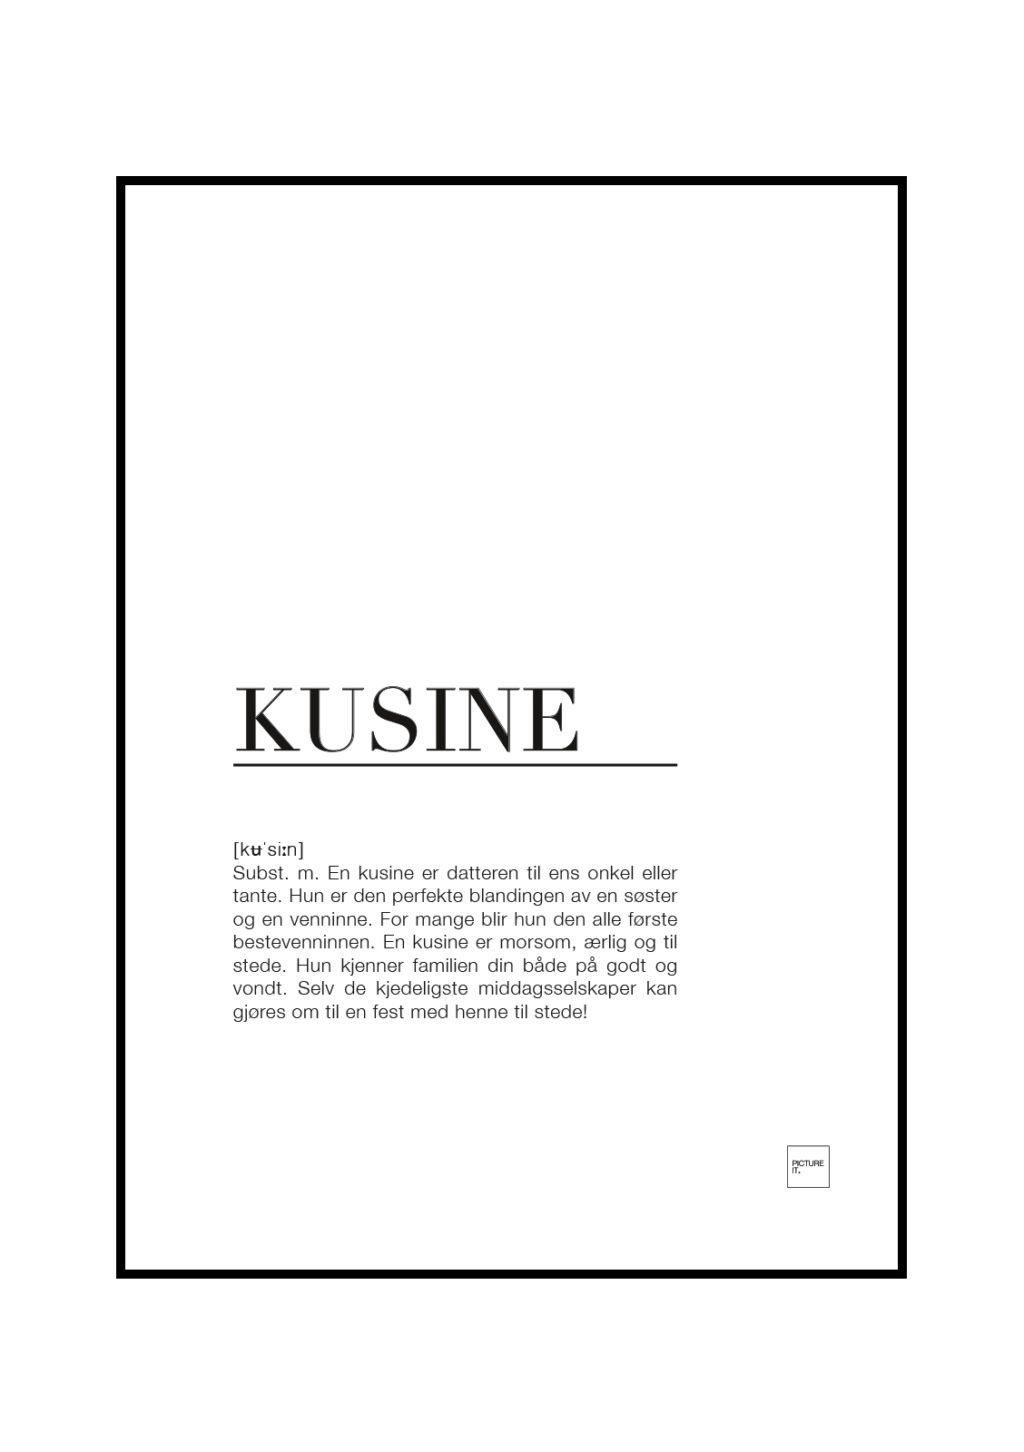 kusine poster